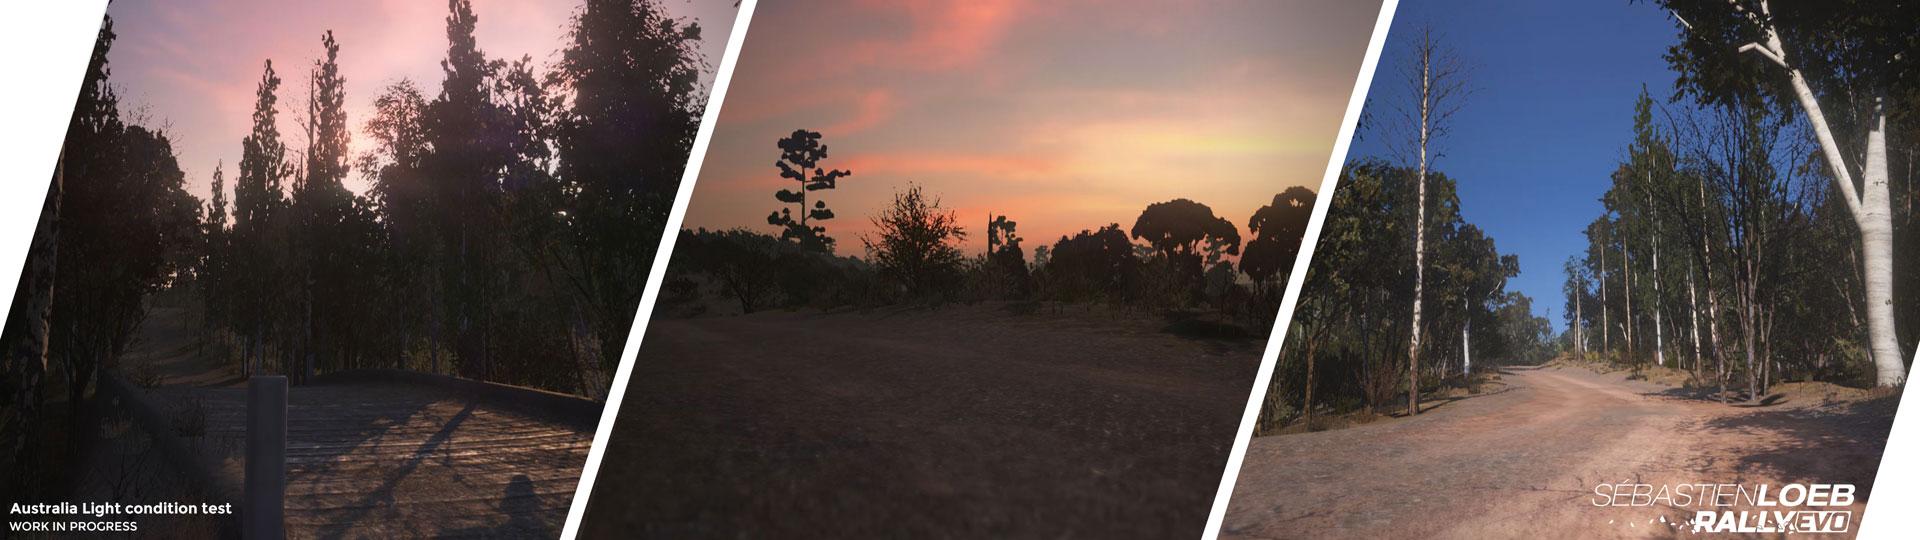 Sebastien Loeb Rally, iluminación en Australia